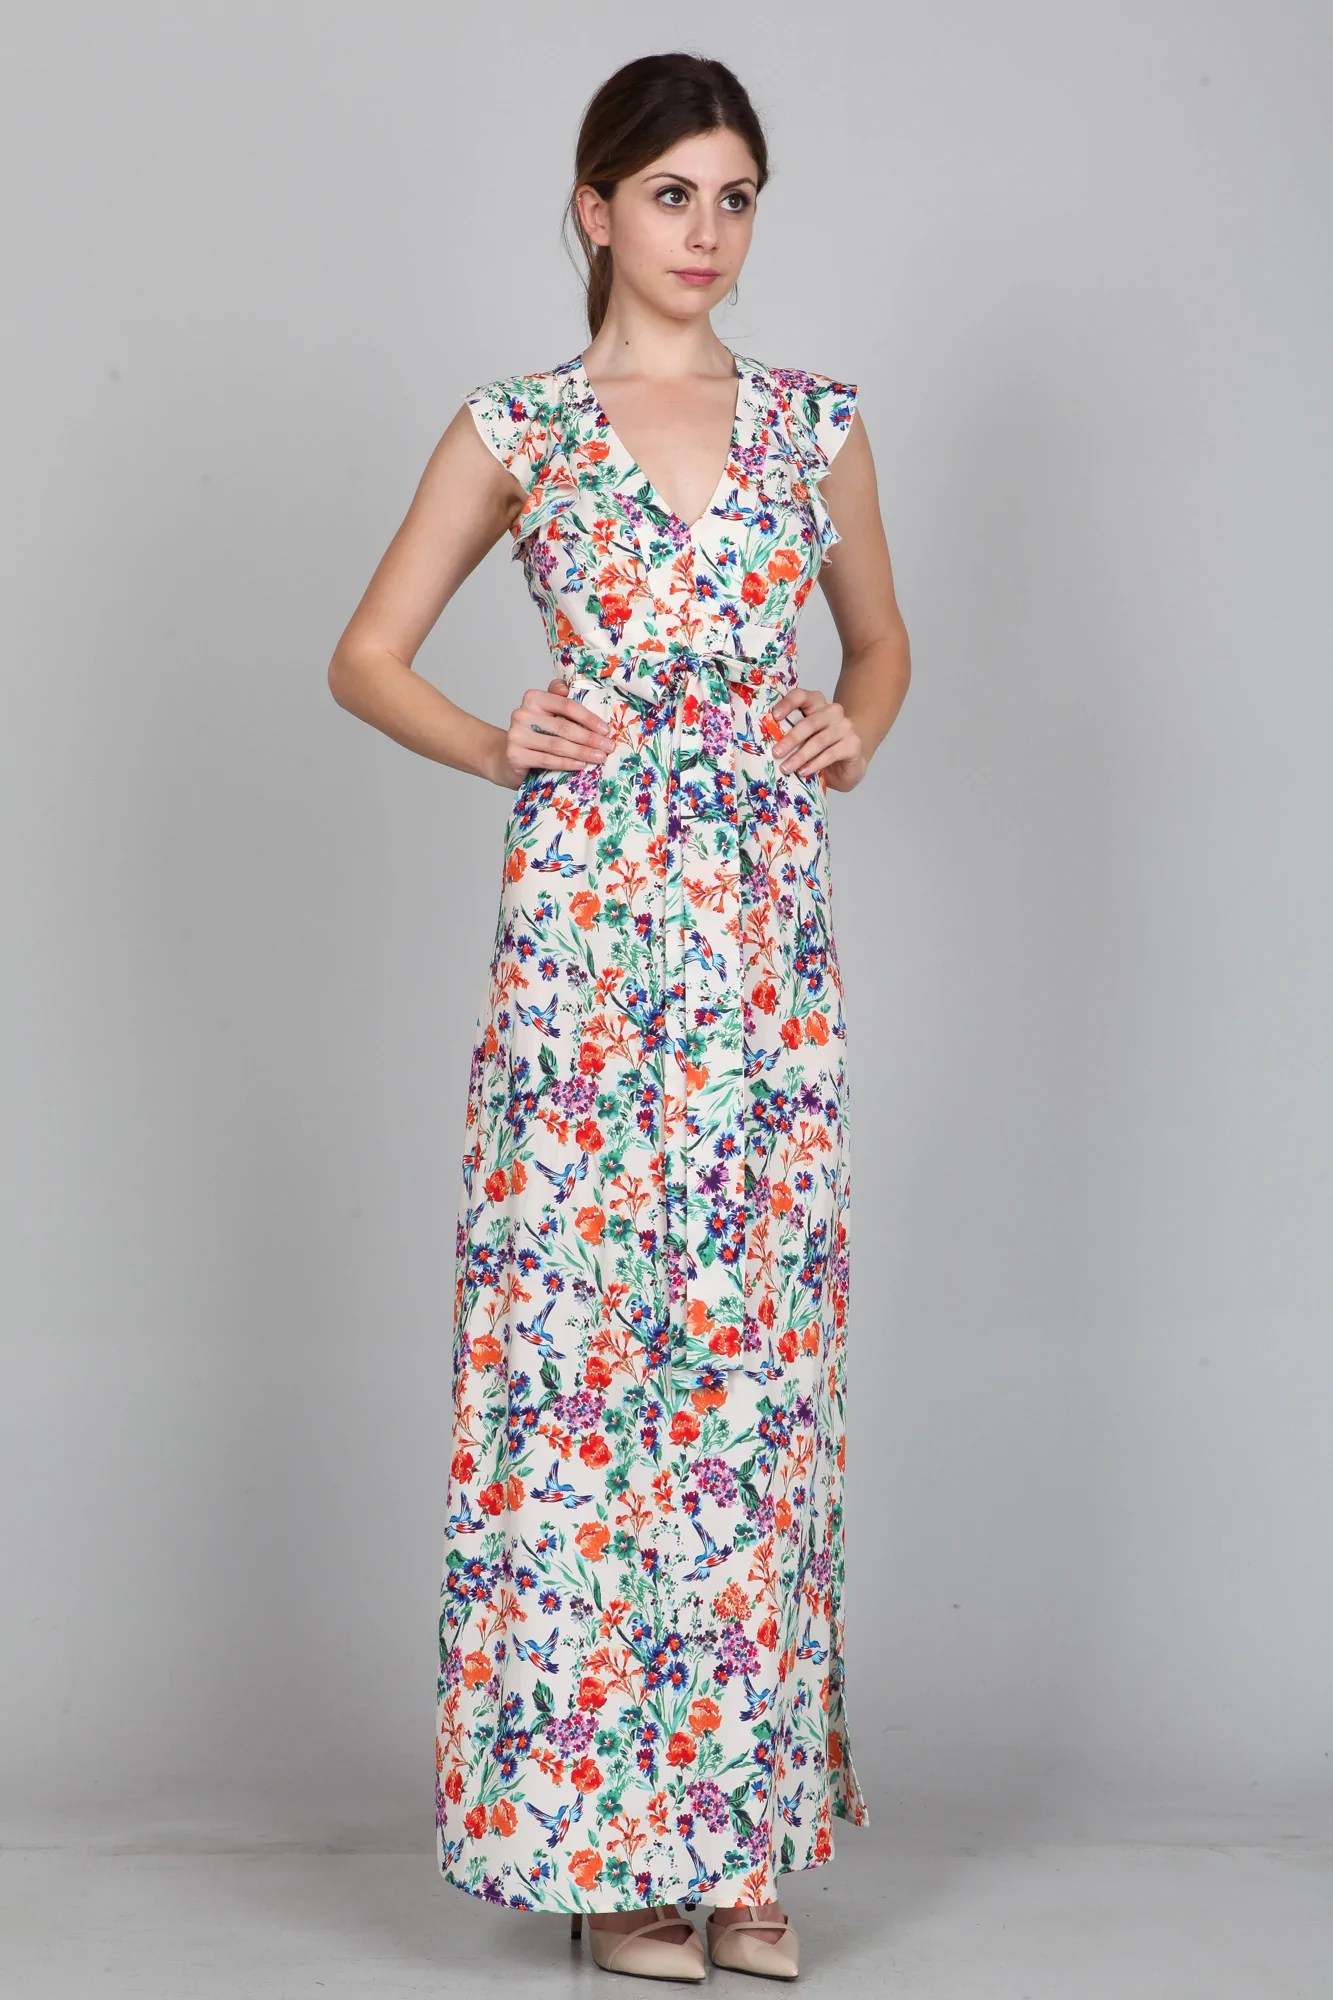 Floral Maxi Dress Cecil Lee